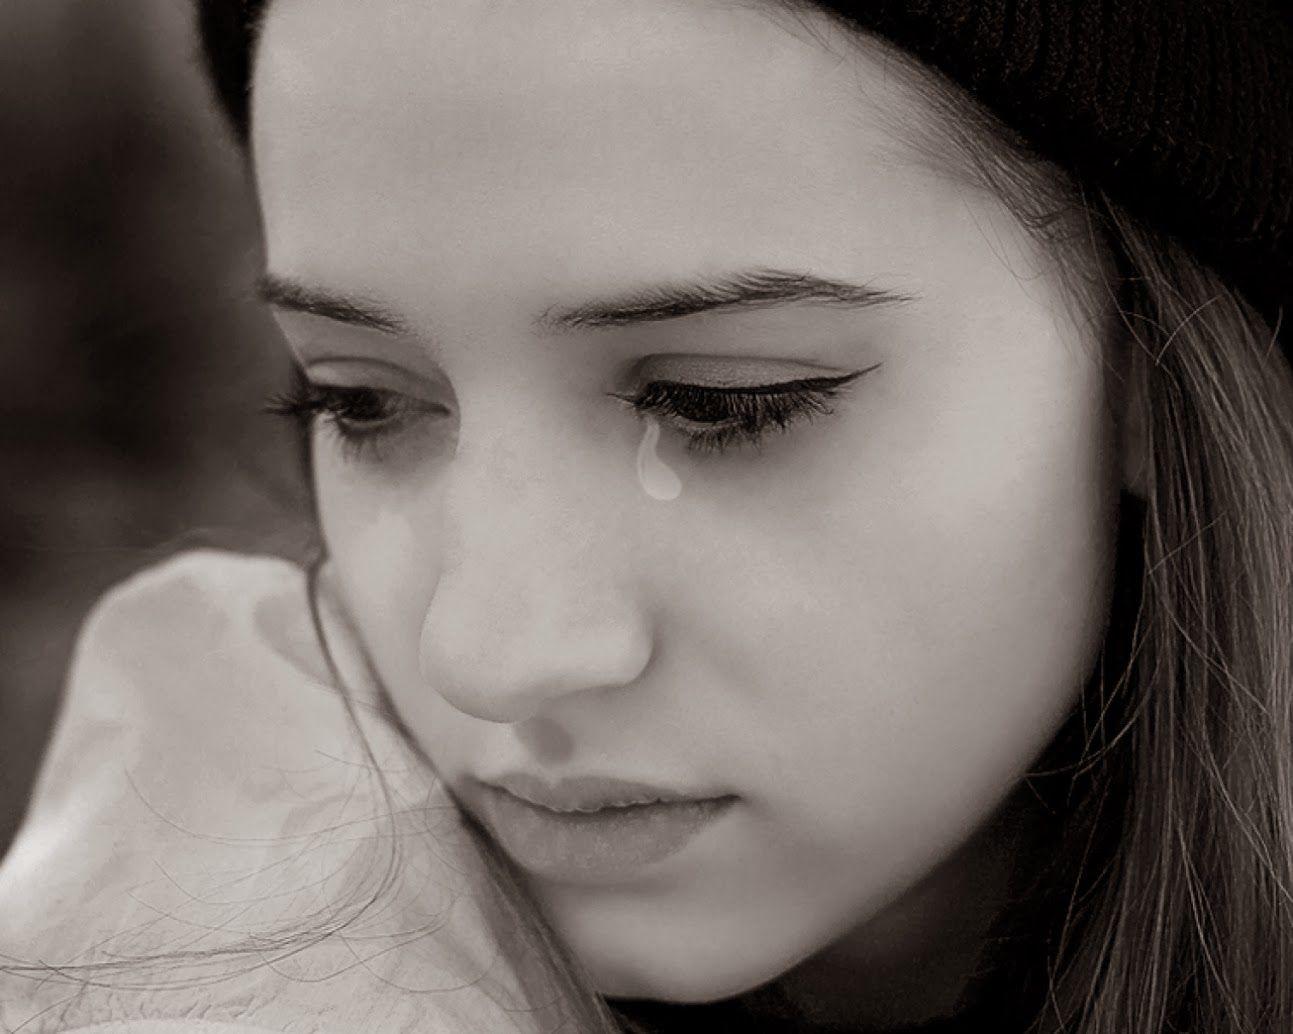 Sad Girl Wallpaper 1080p For Desktop Wallpaper 1293 X 1034 Px 401 73